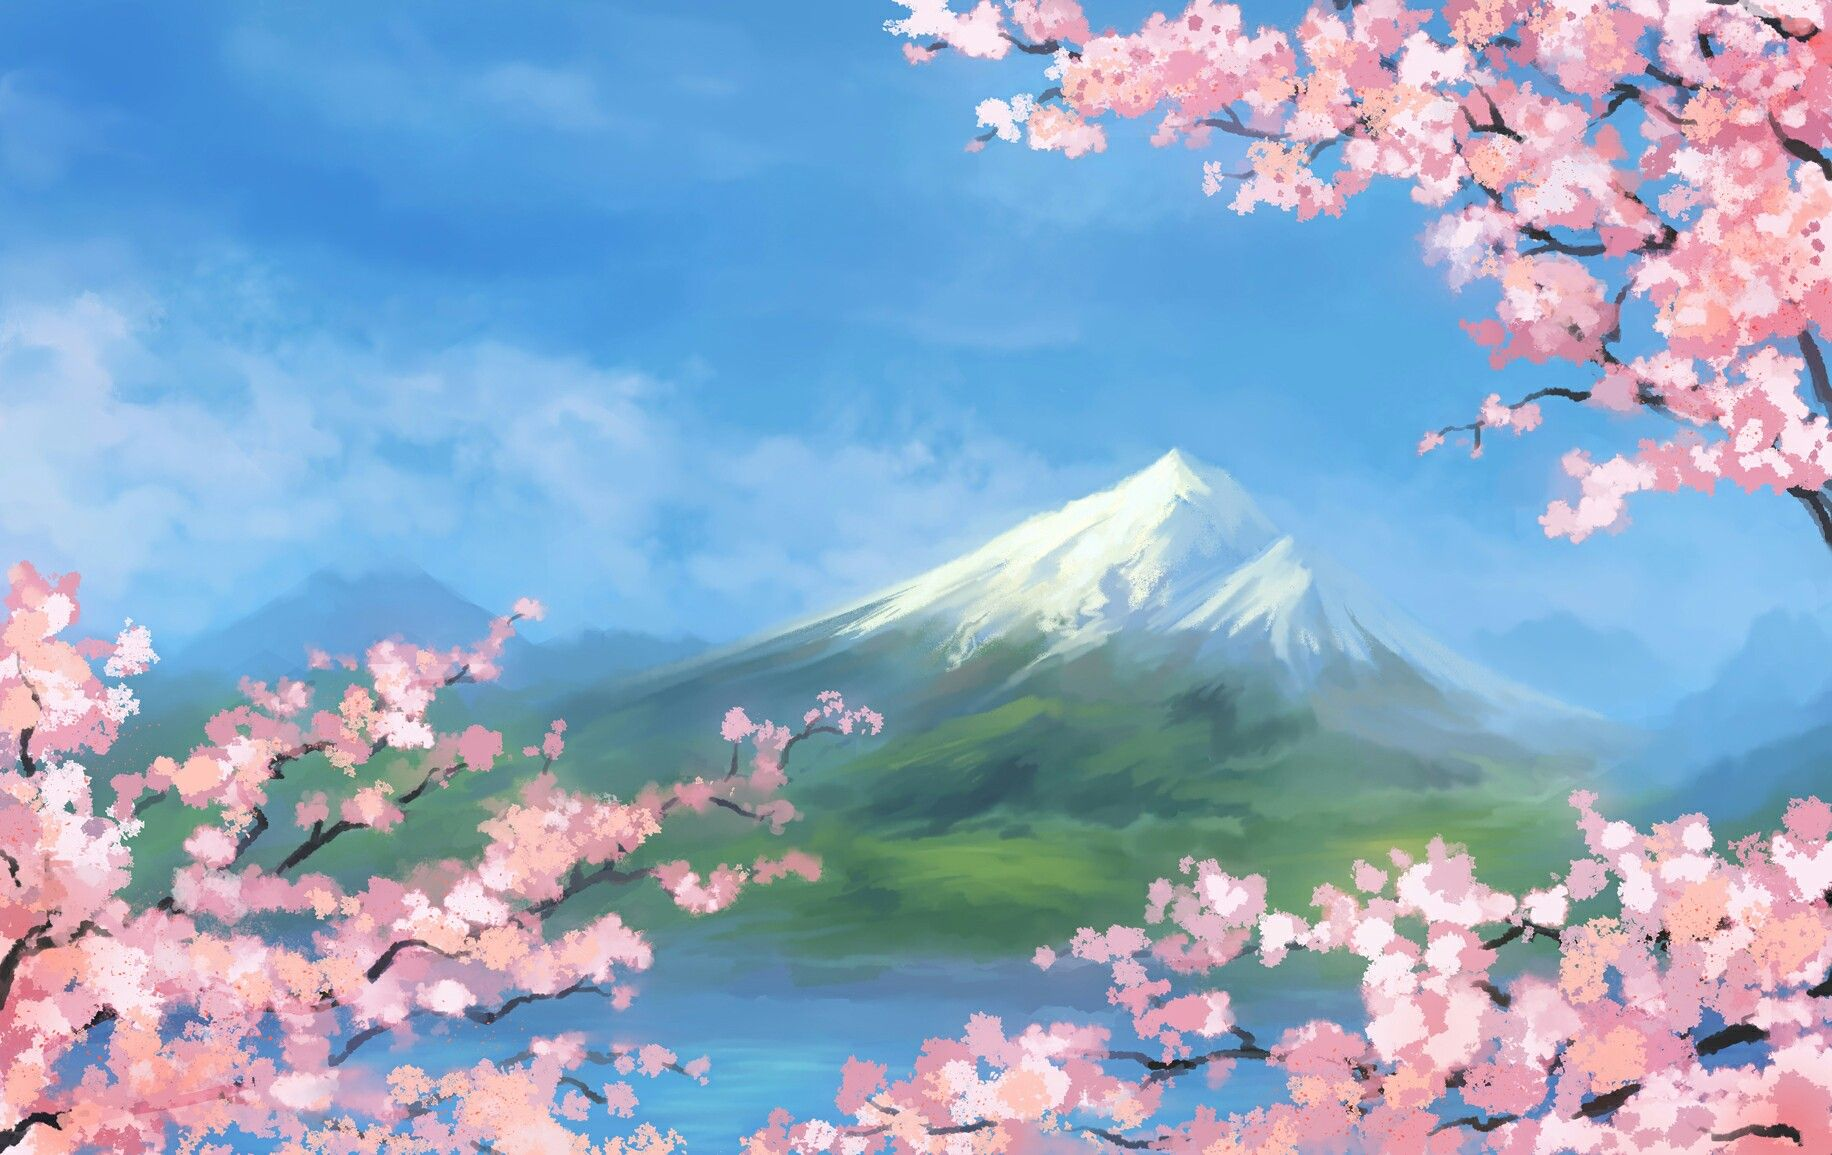 The Nature Of Anime Nature Anime Sky Wallpapers Kawaii View Kurdishotaku Image Art طبيعة خلفيات أنمي أجمل منظر فن رسم صور